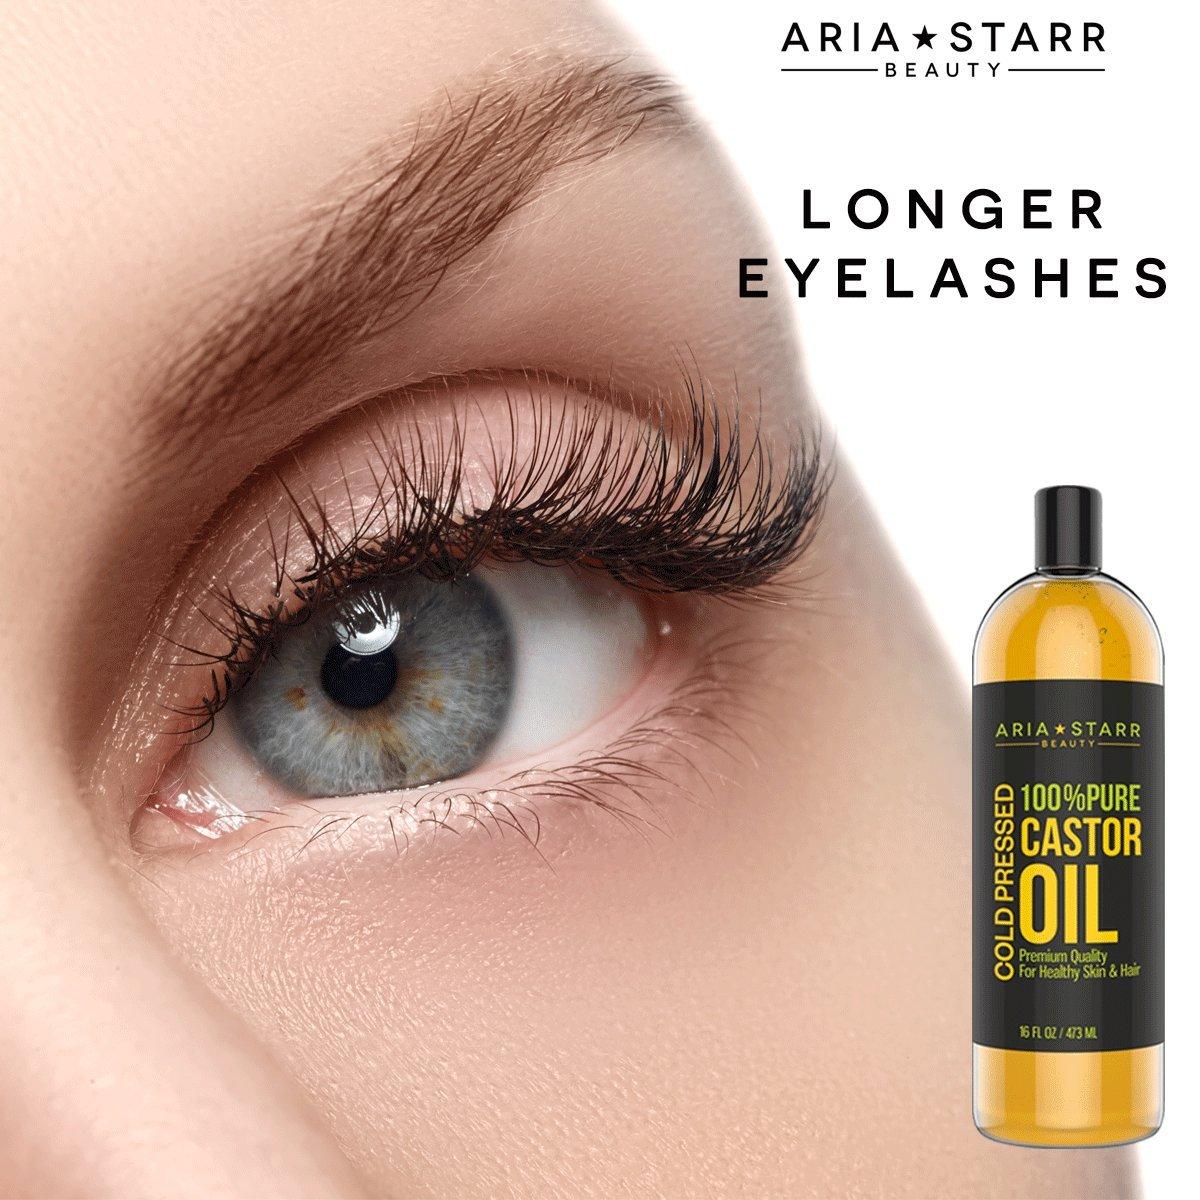 Aria Starr Castor Oil